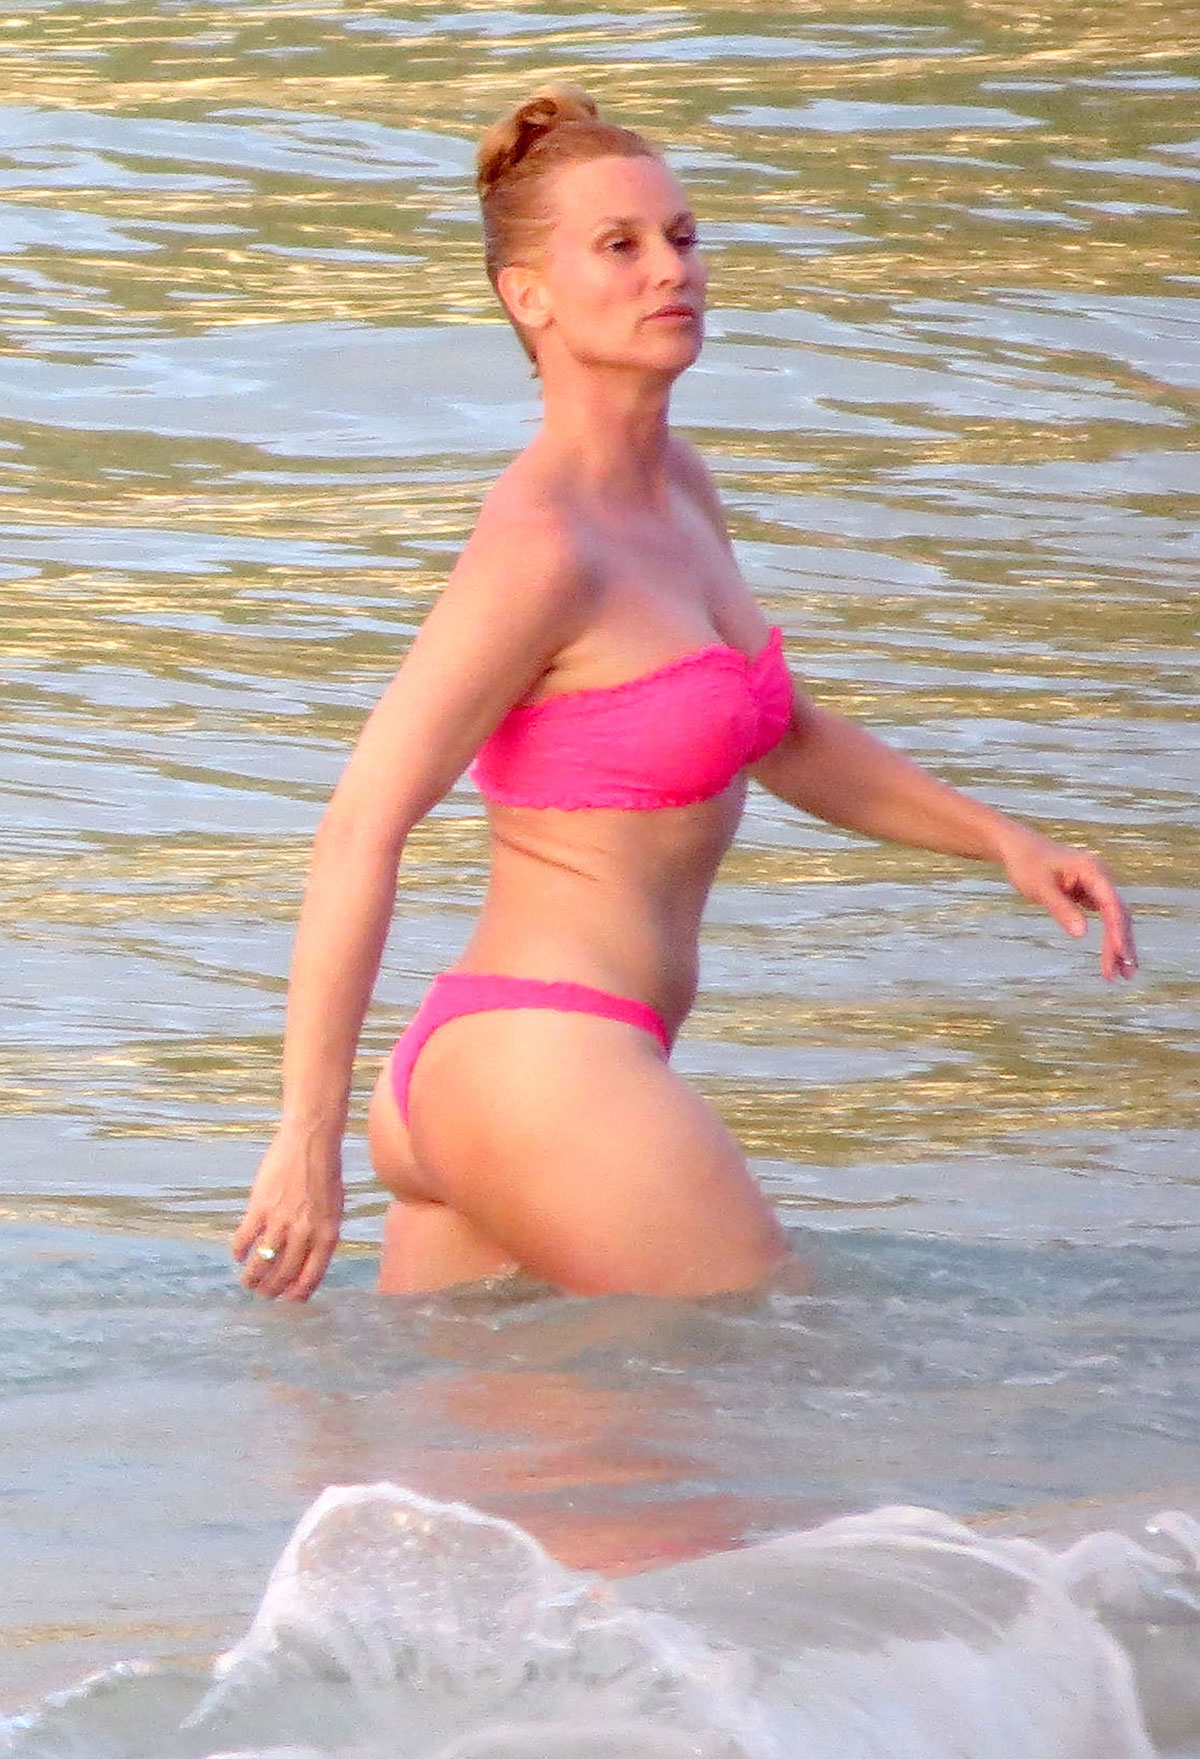 Bikini Nicolette Sheridan nude photos 2019